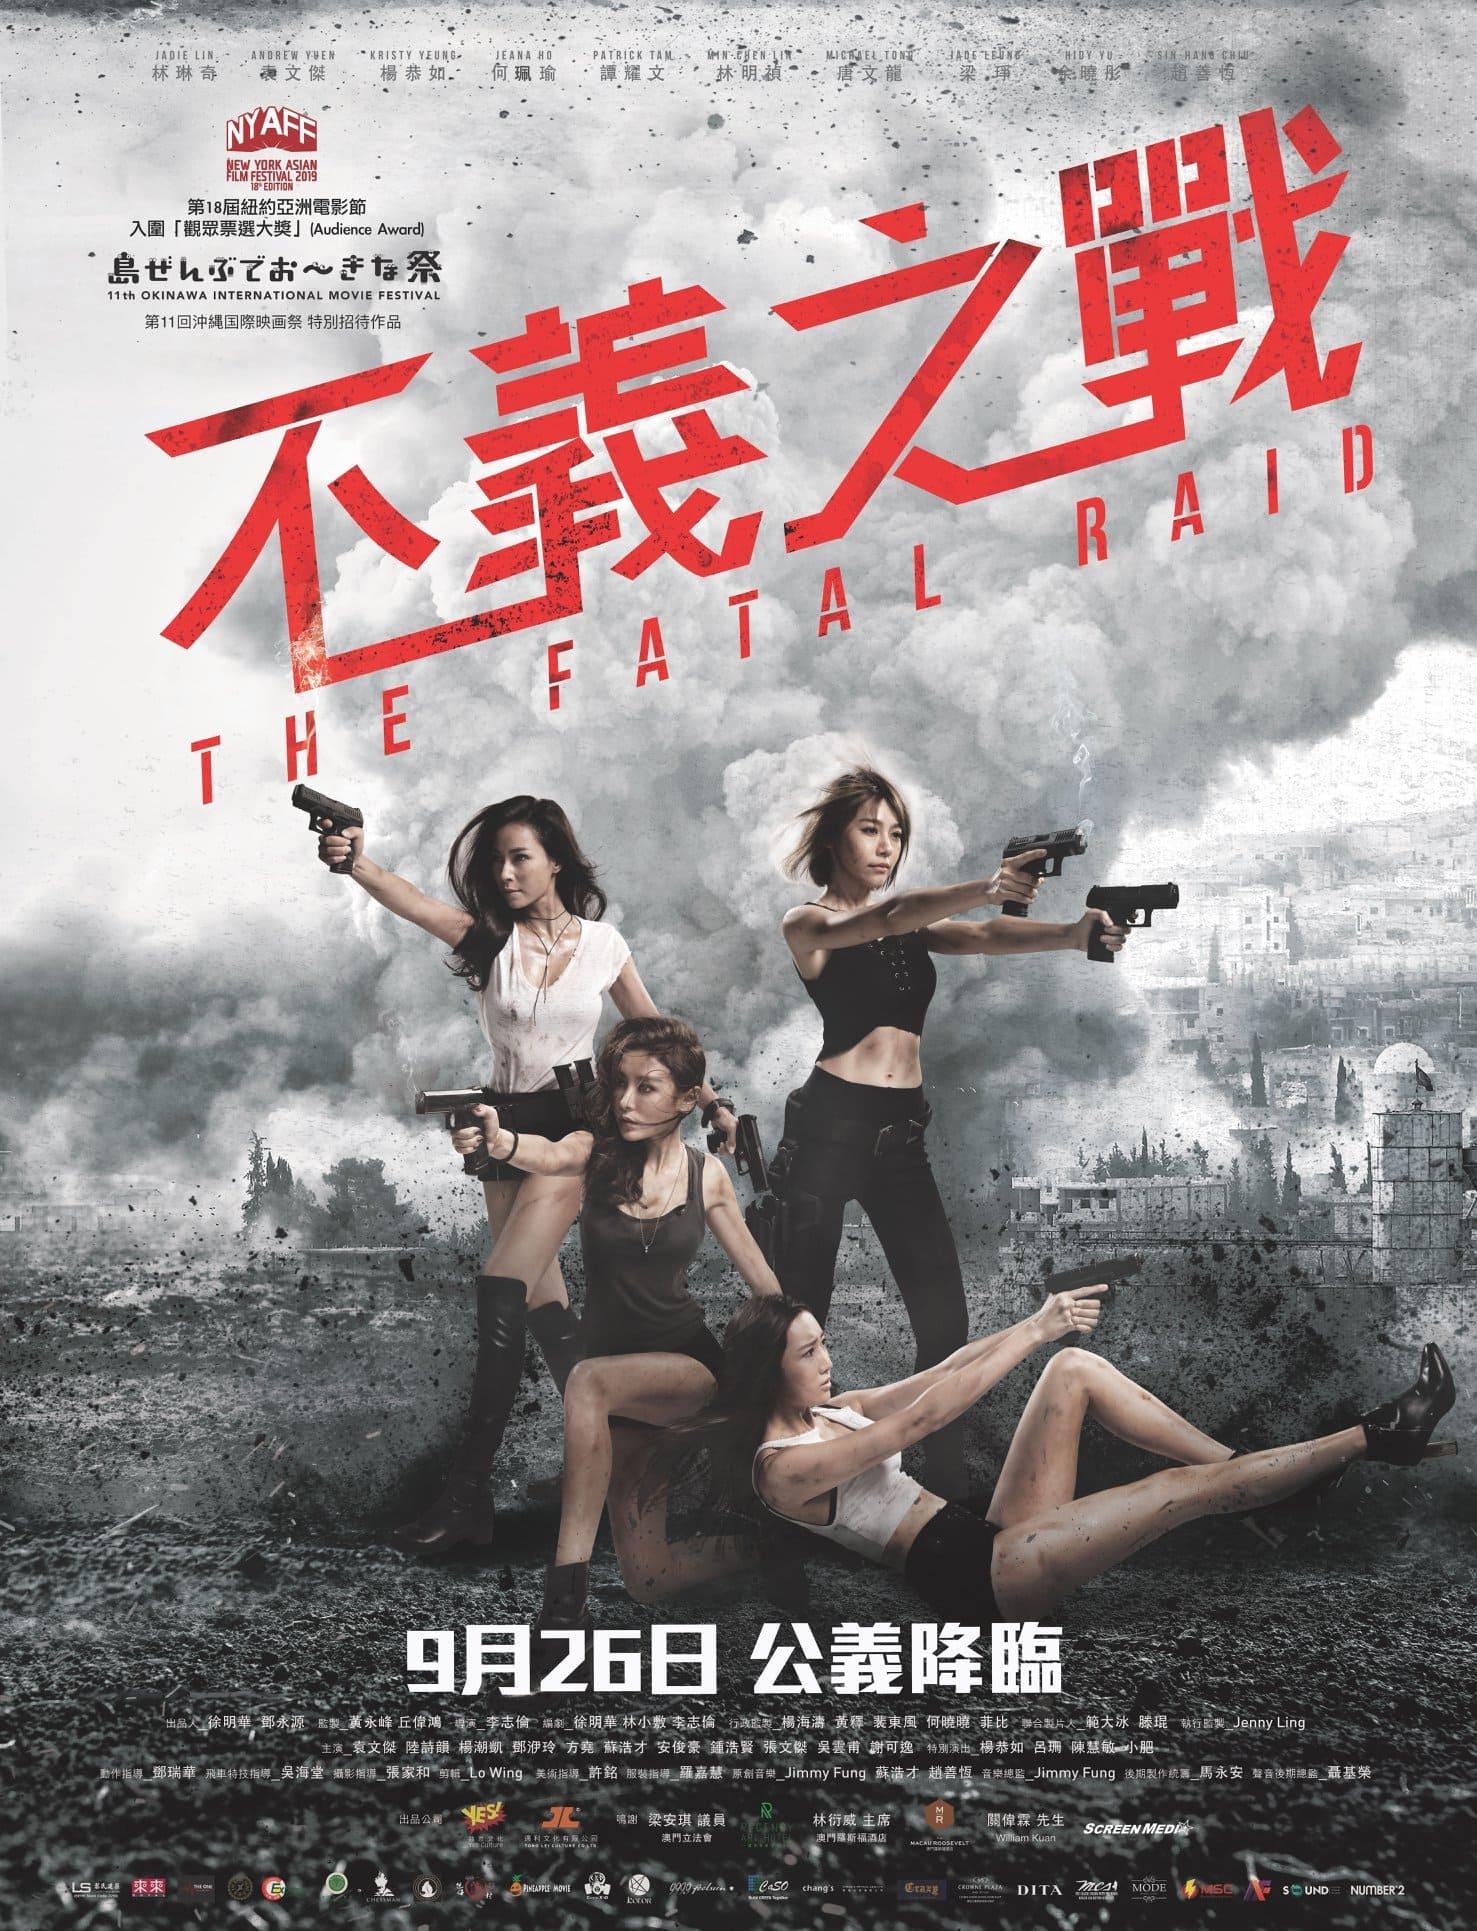 【不義之戰】The Fatal Raid--->公義降臨